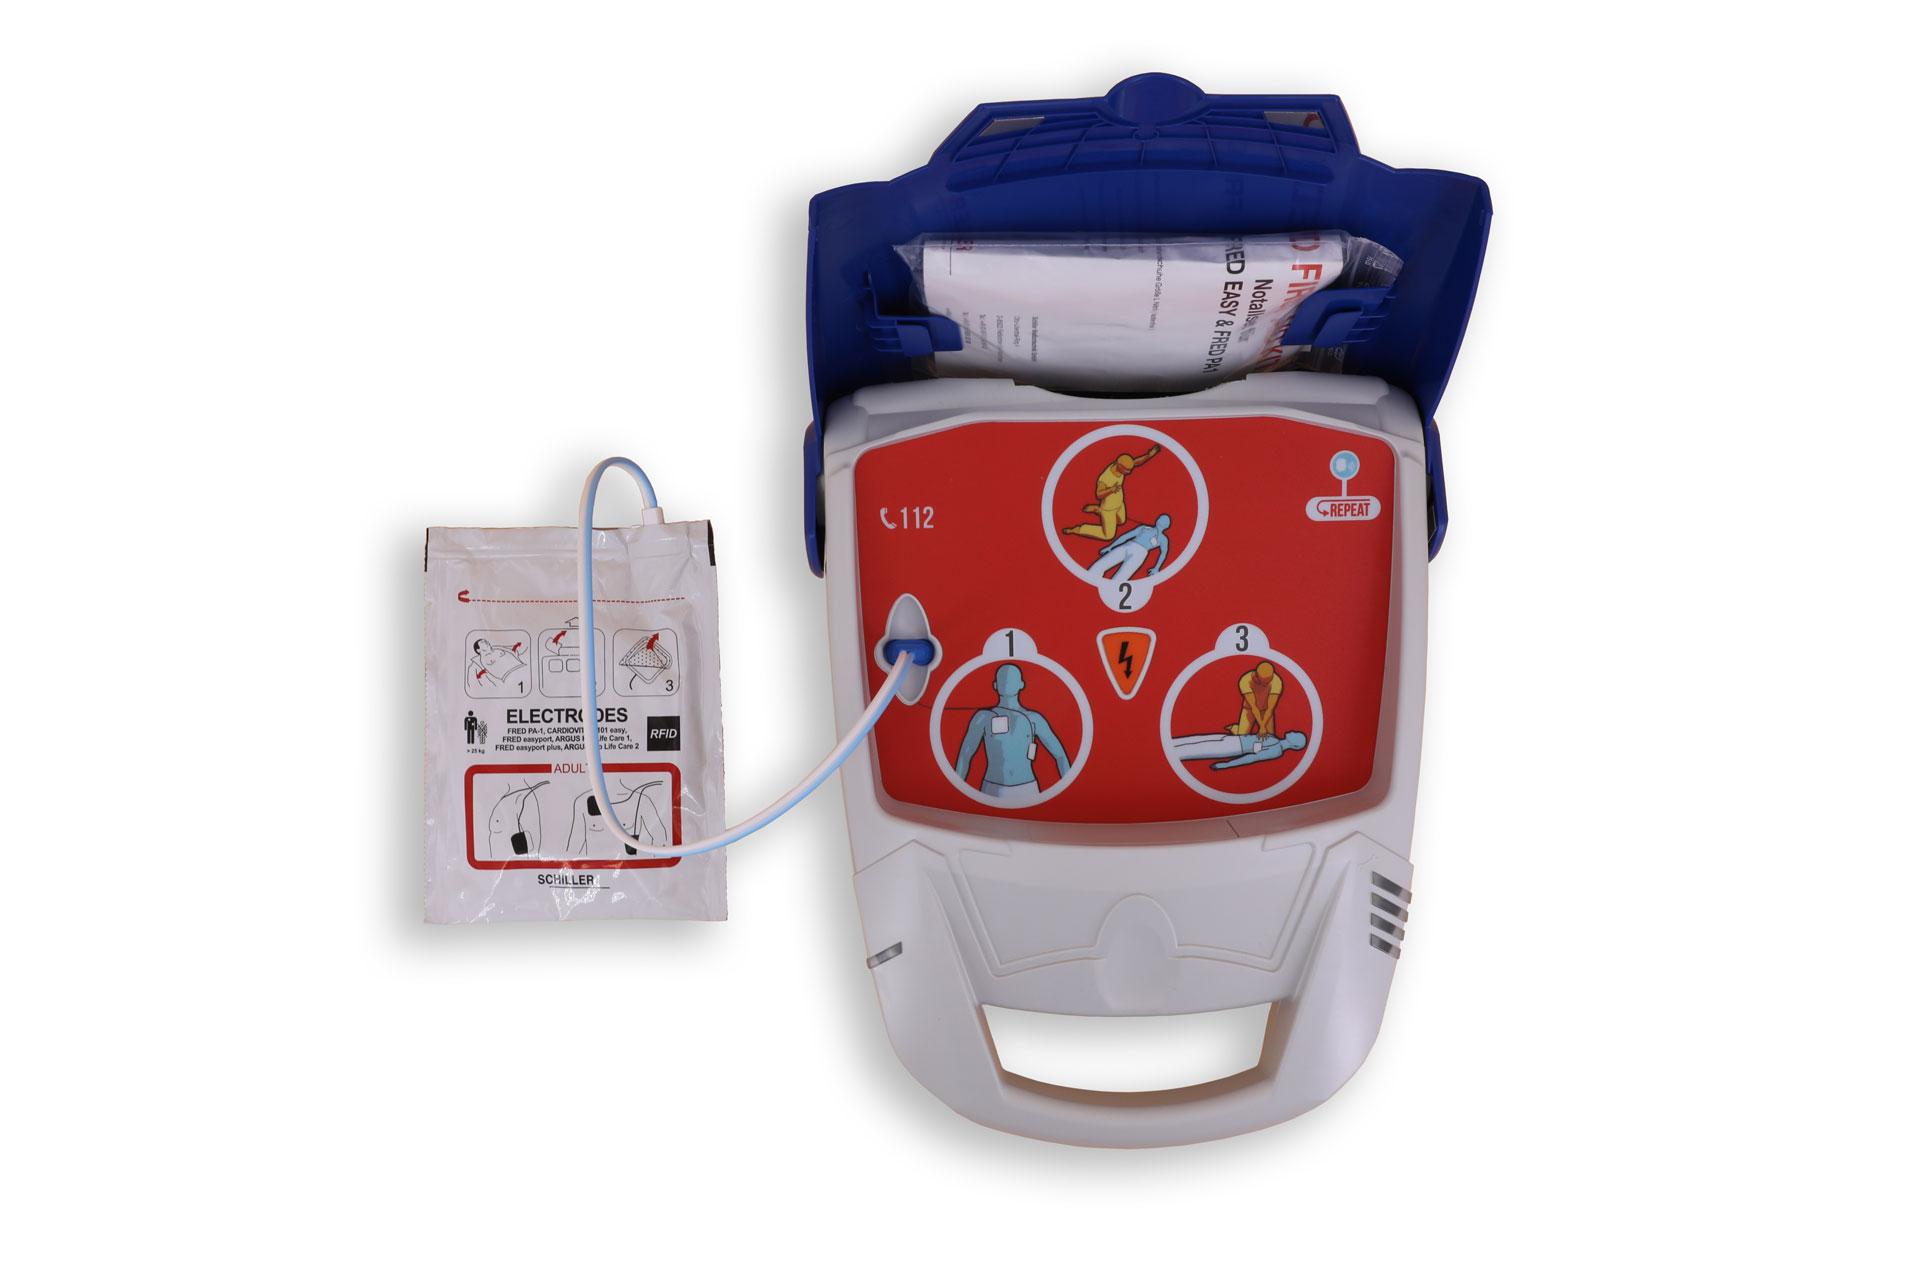 Notfallretter.de® Basic AED - geöffnet